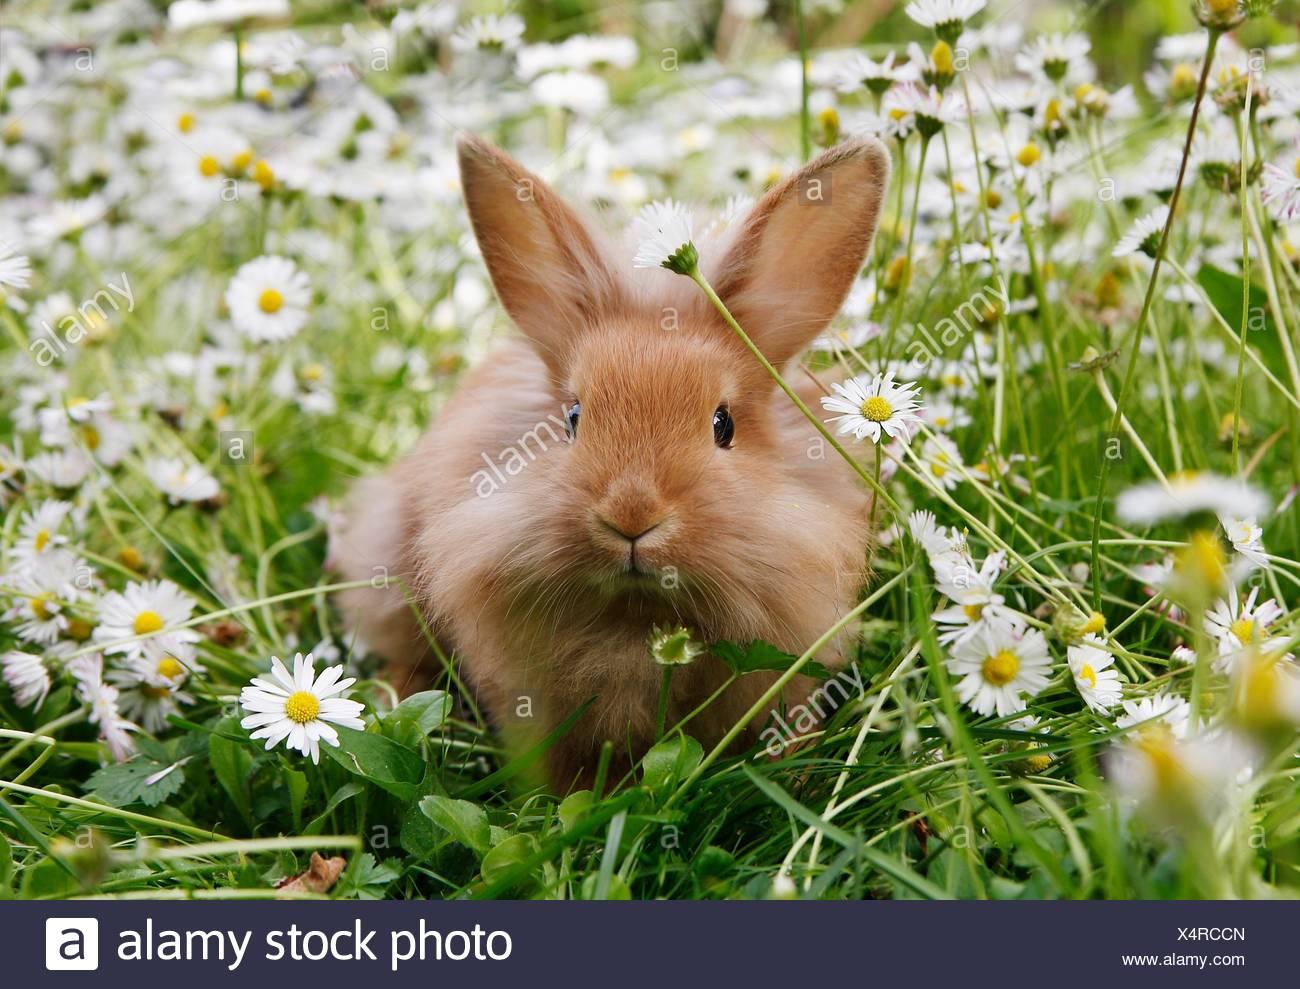 Rabbit Stockholm - Stock Image